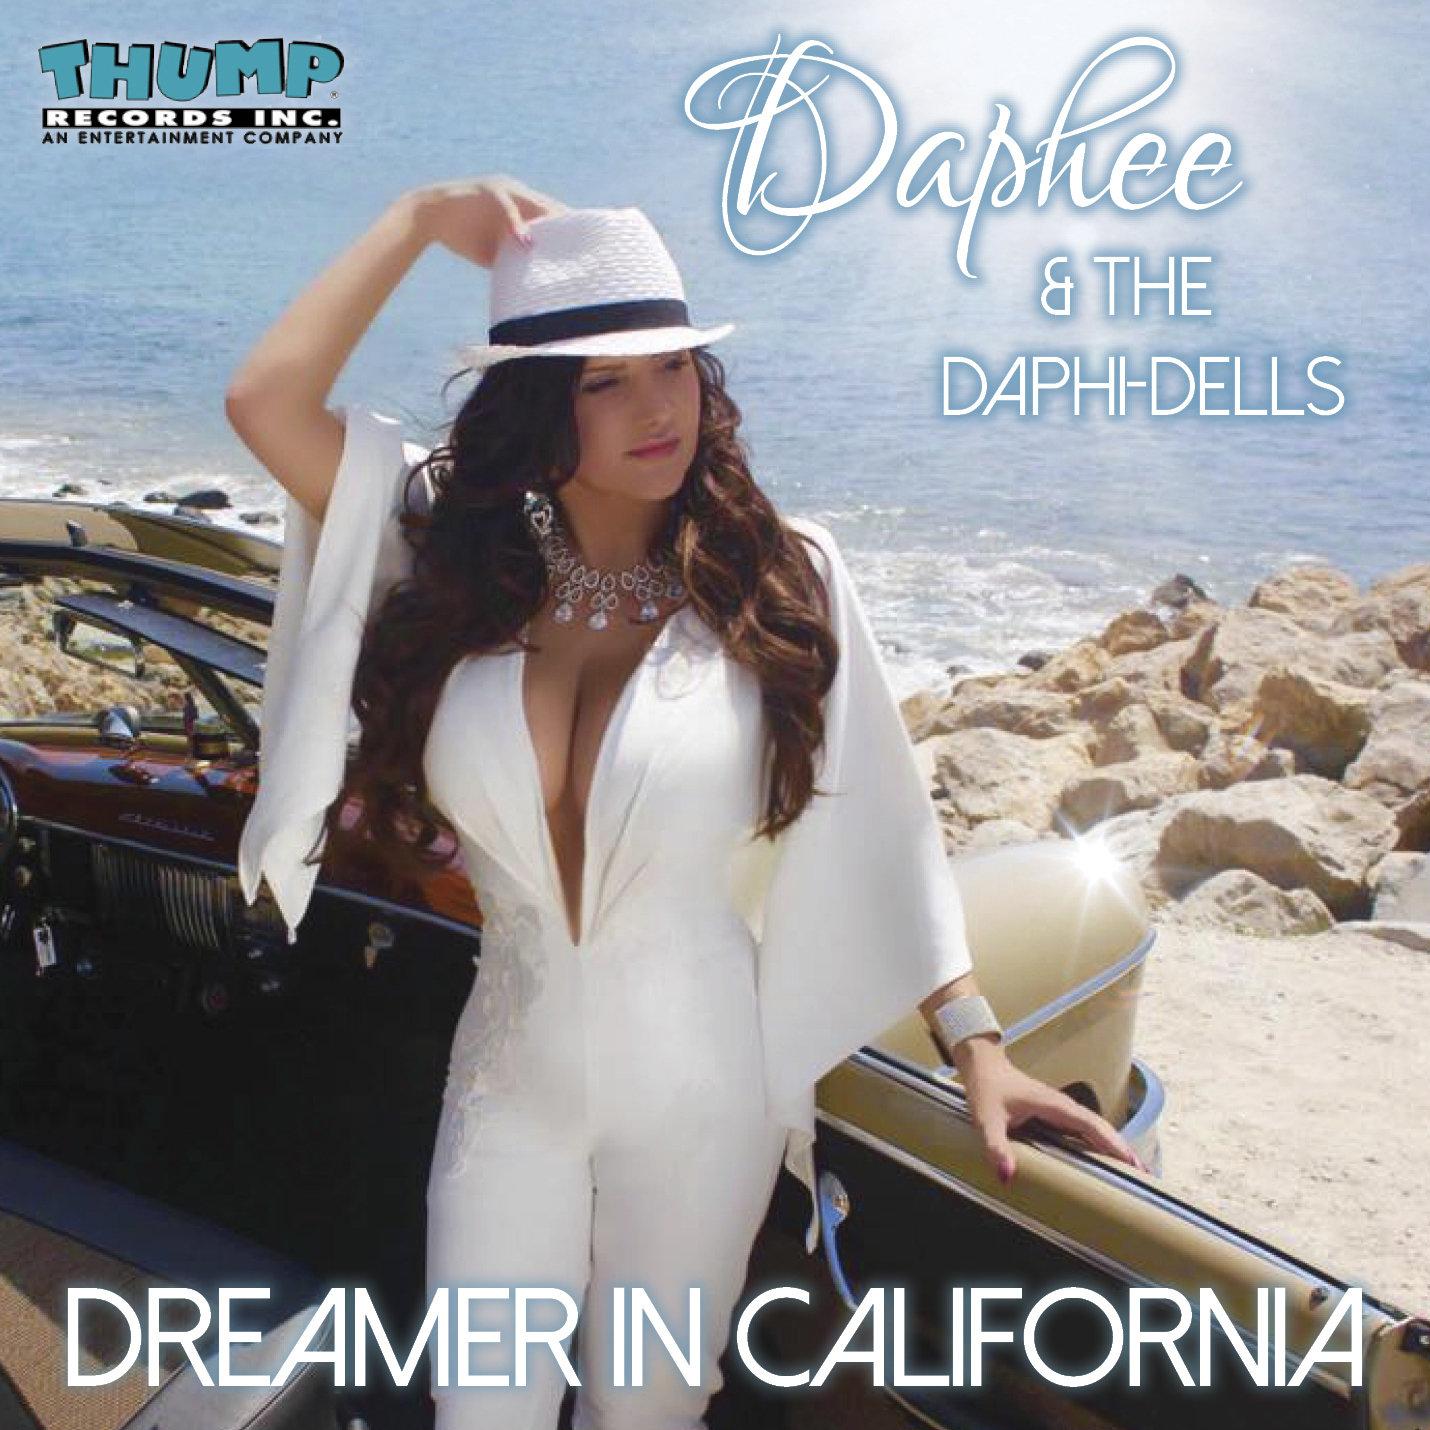 Dreamer in California CDDIC